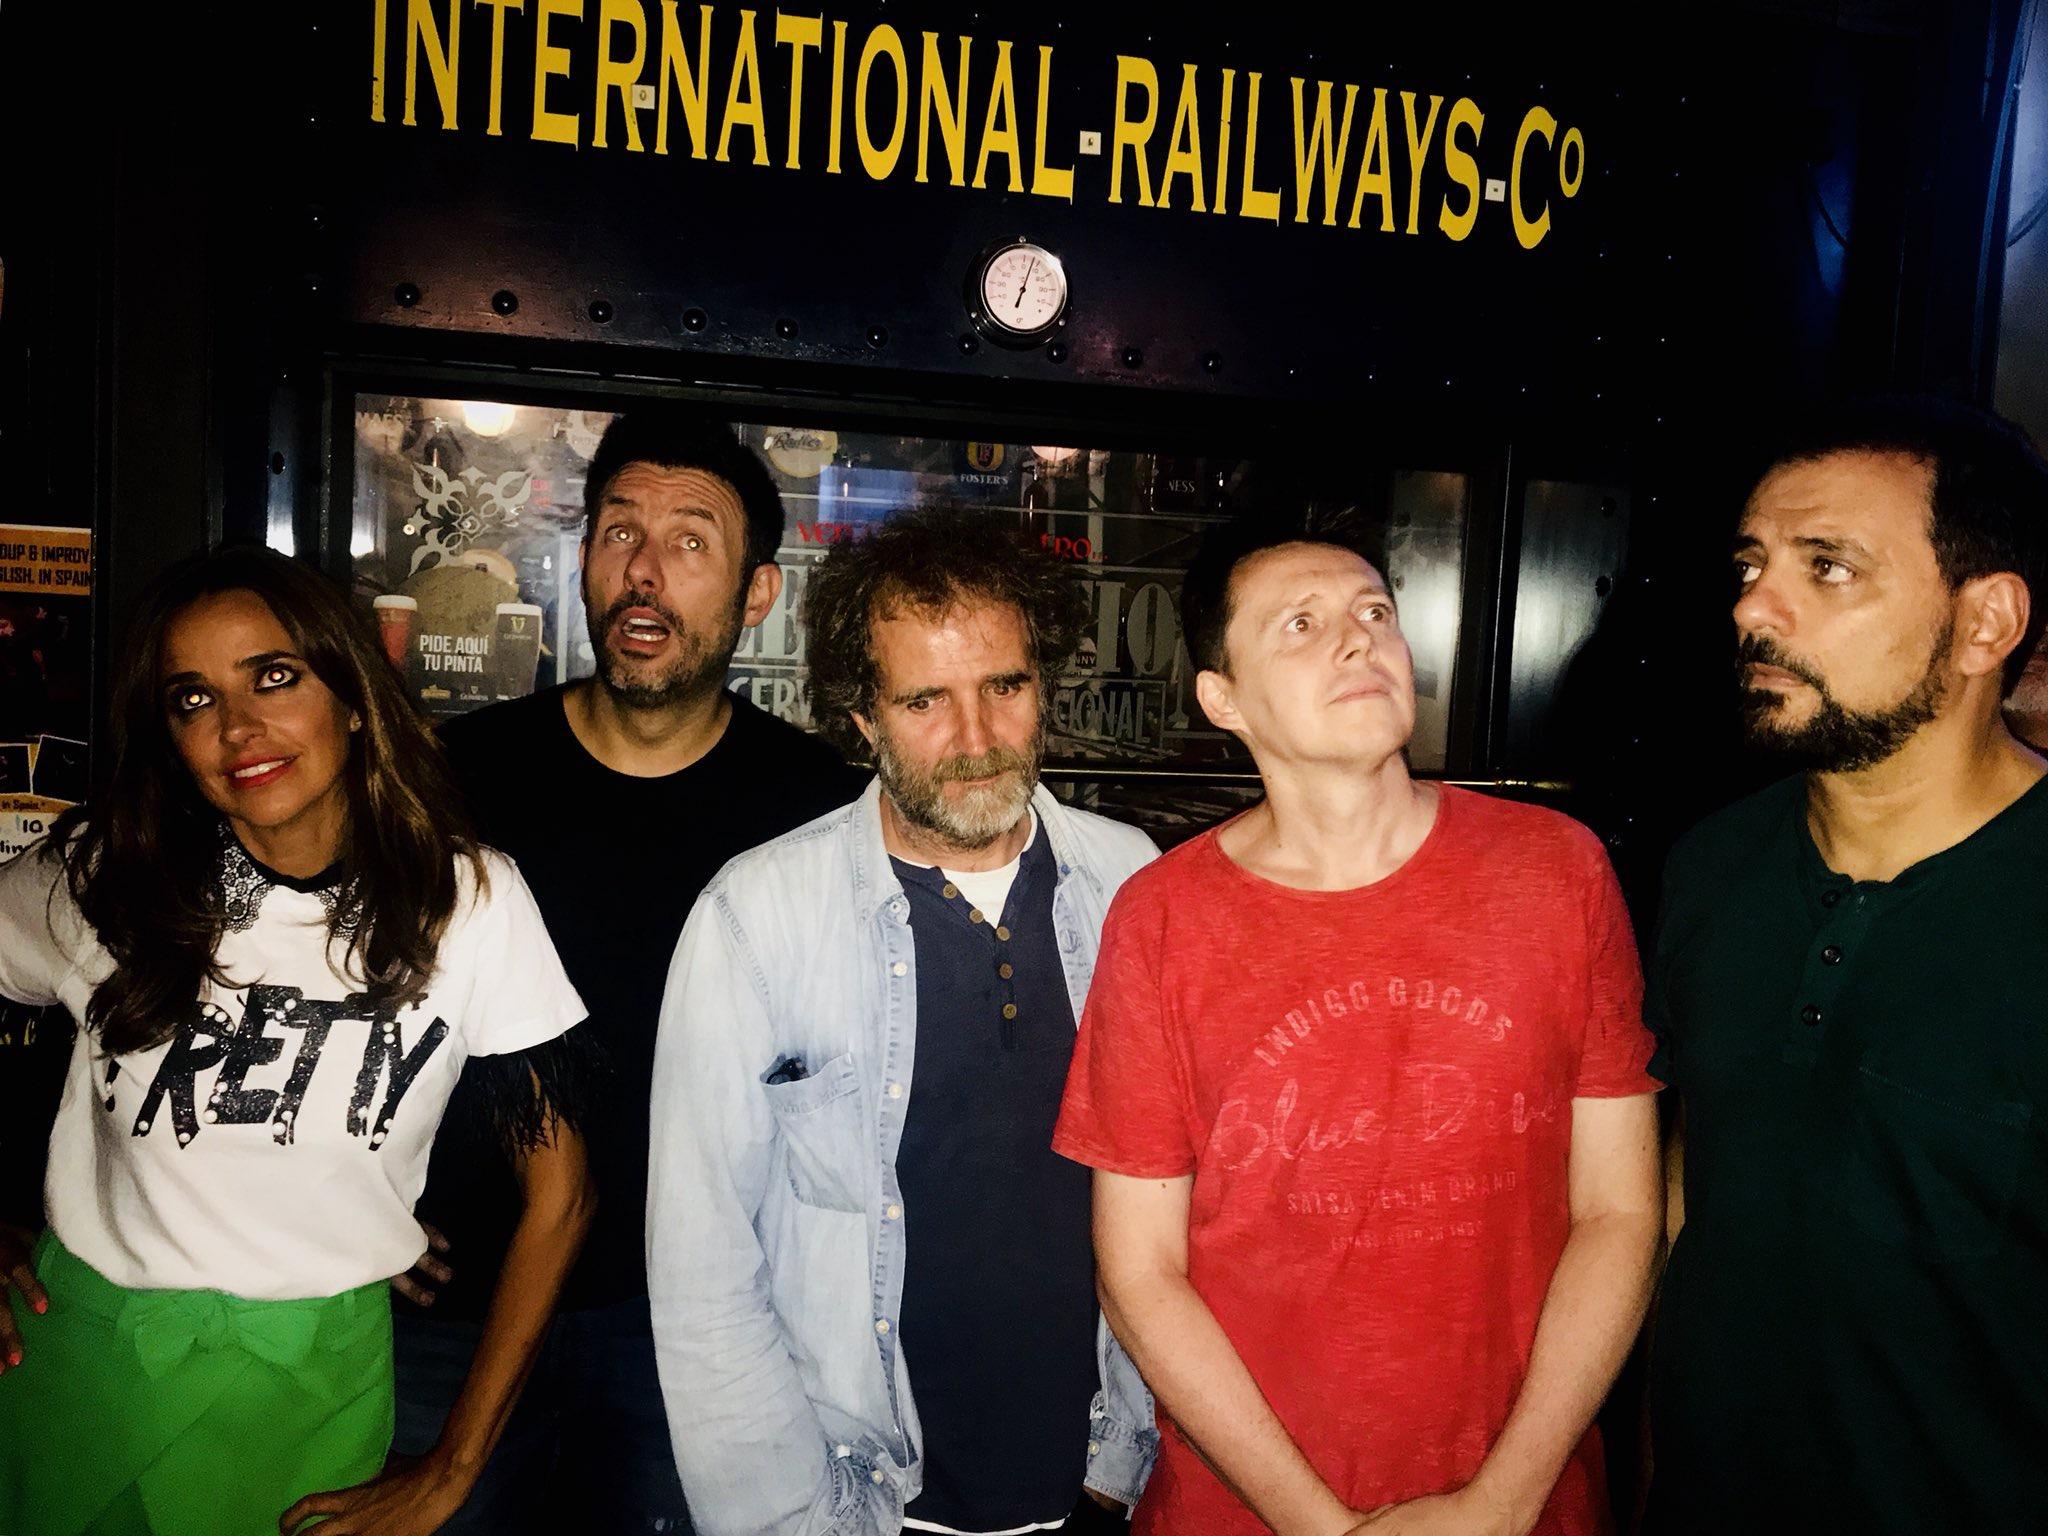 Comikazes - Don Mauro - Iñaki Urrutia - Juan Solo - Carlos Clavijo - Carmen Alcayde - Beer Station - Banzai